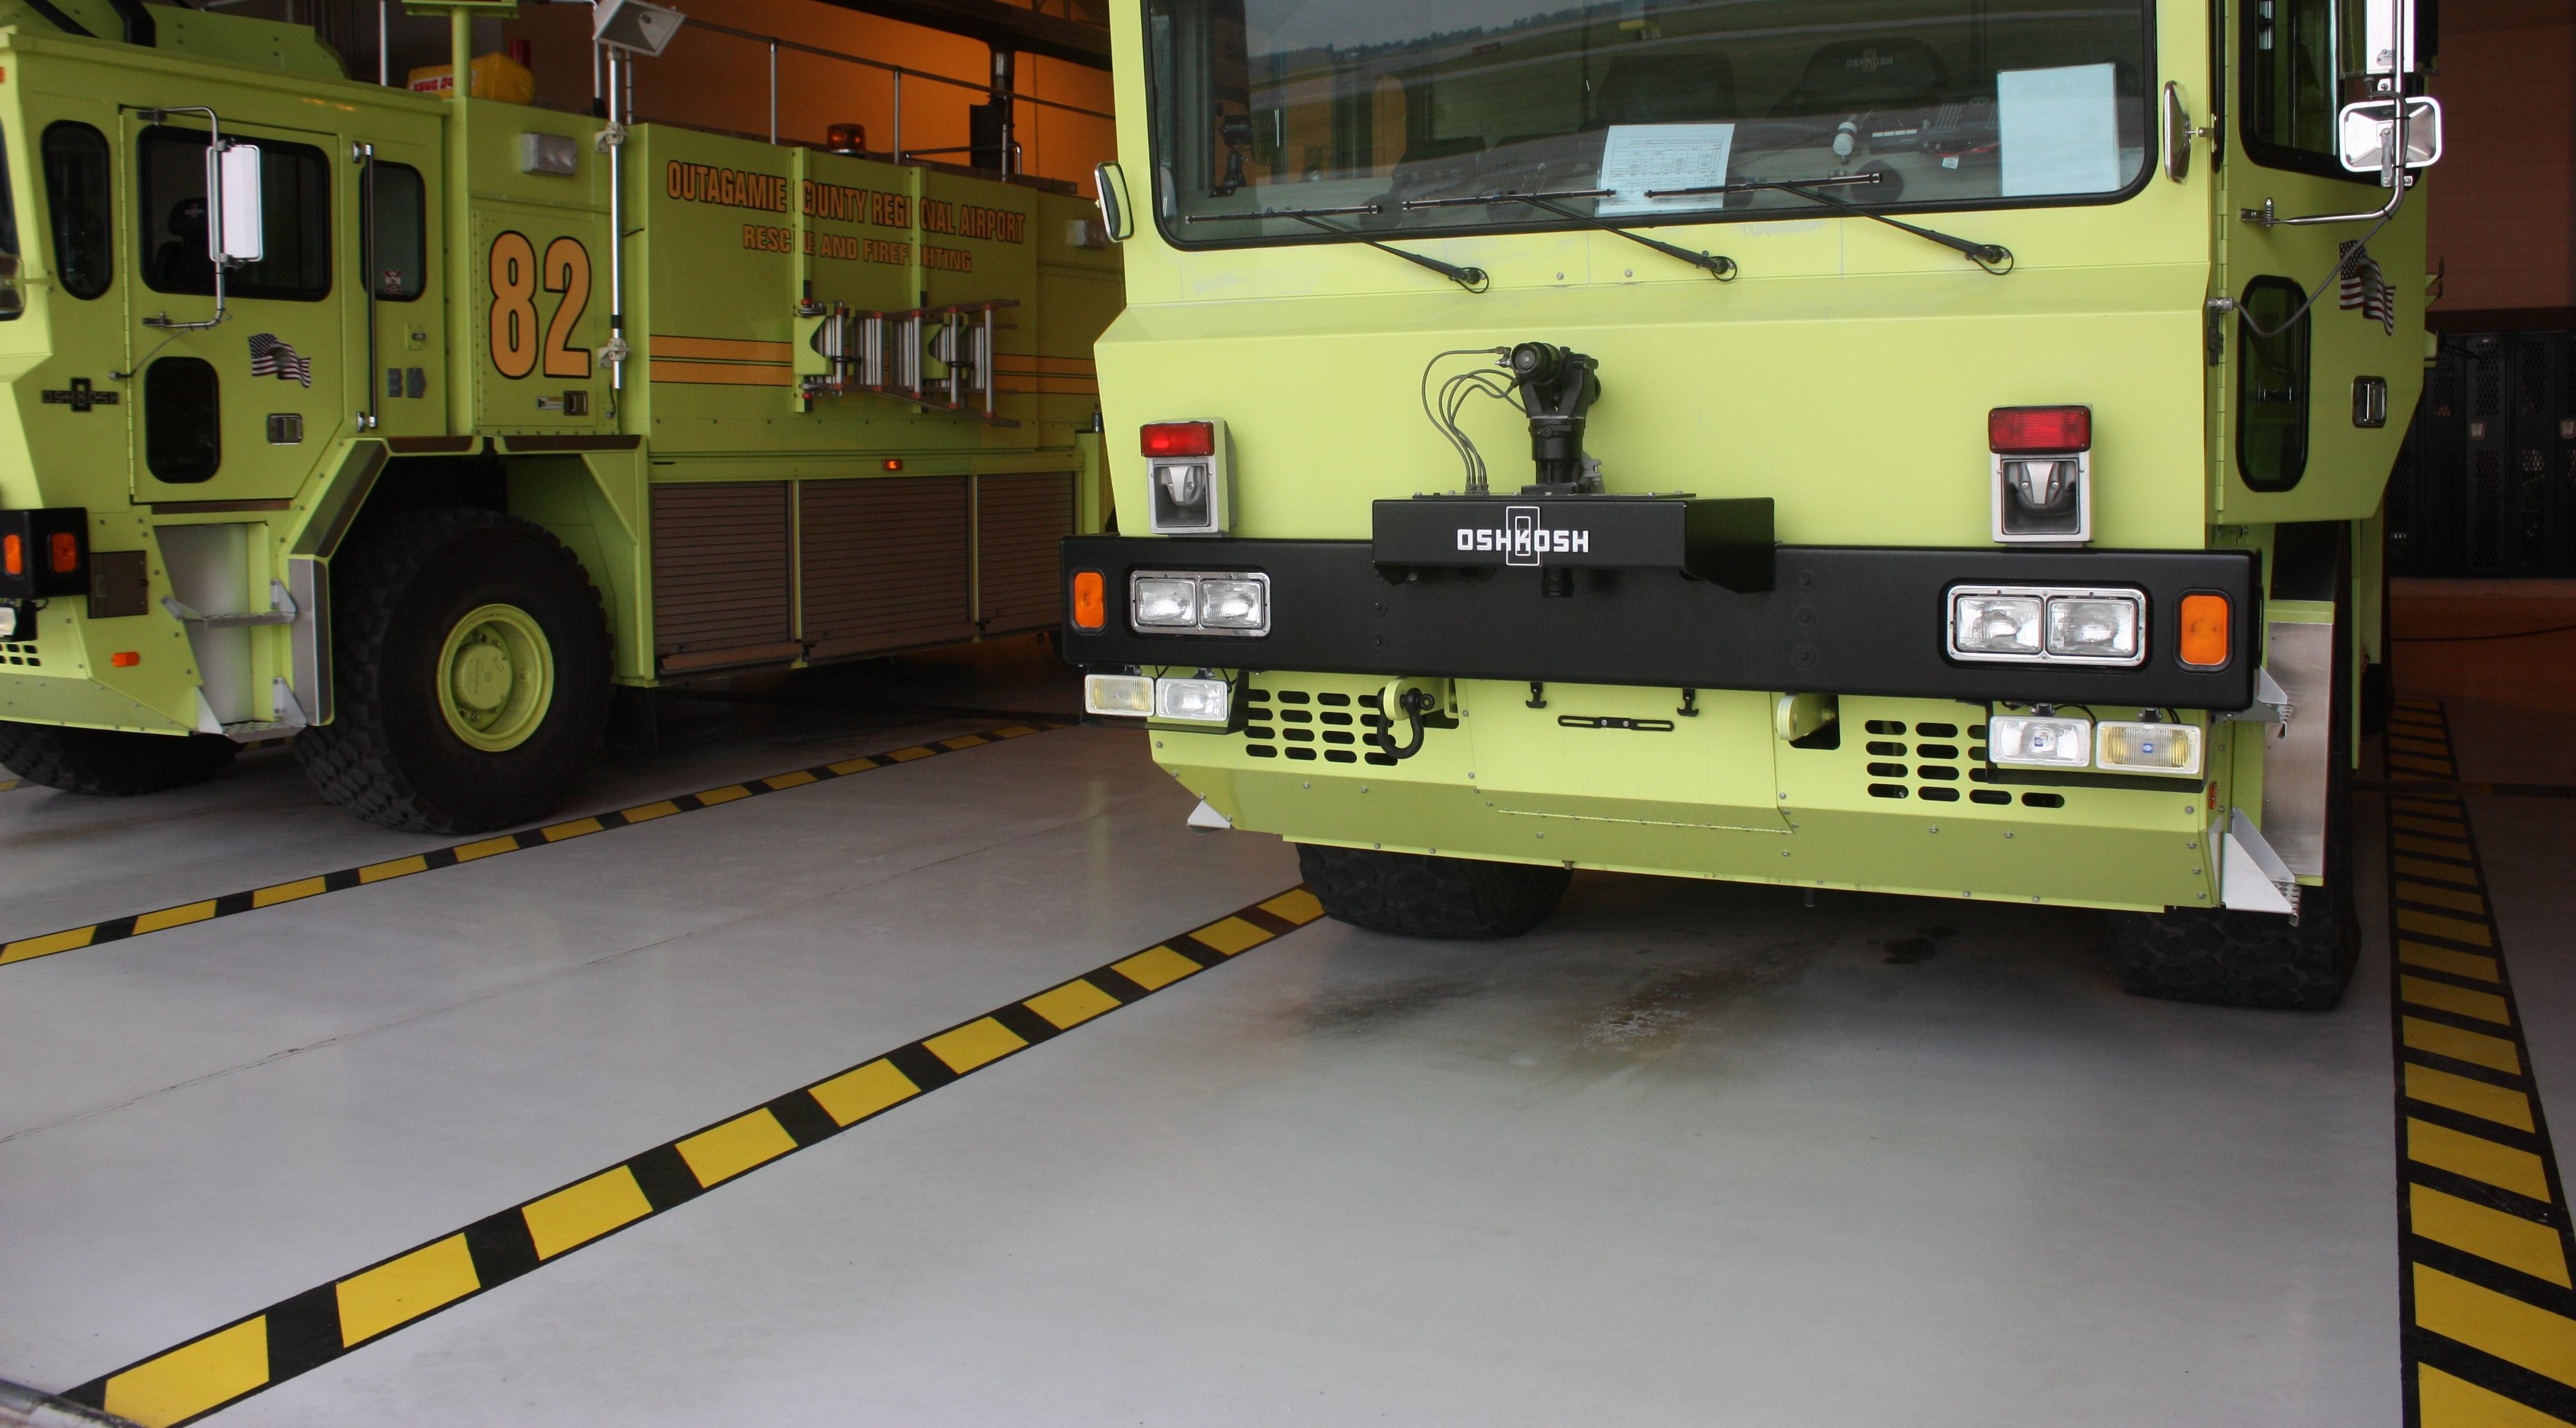 Airport emergency vehicles